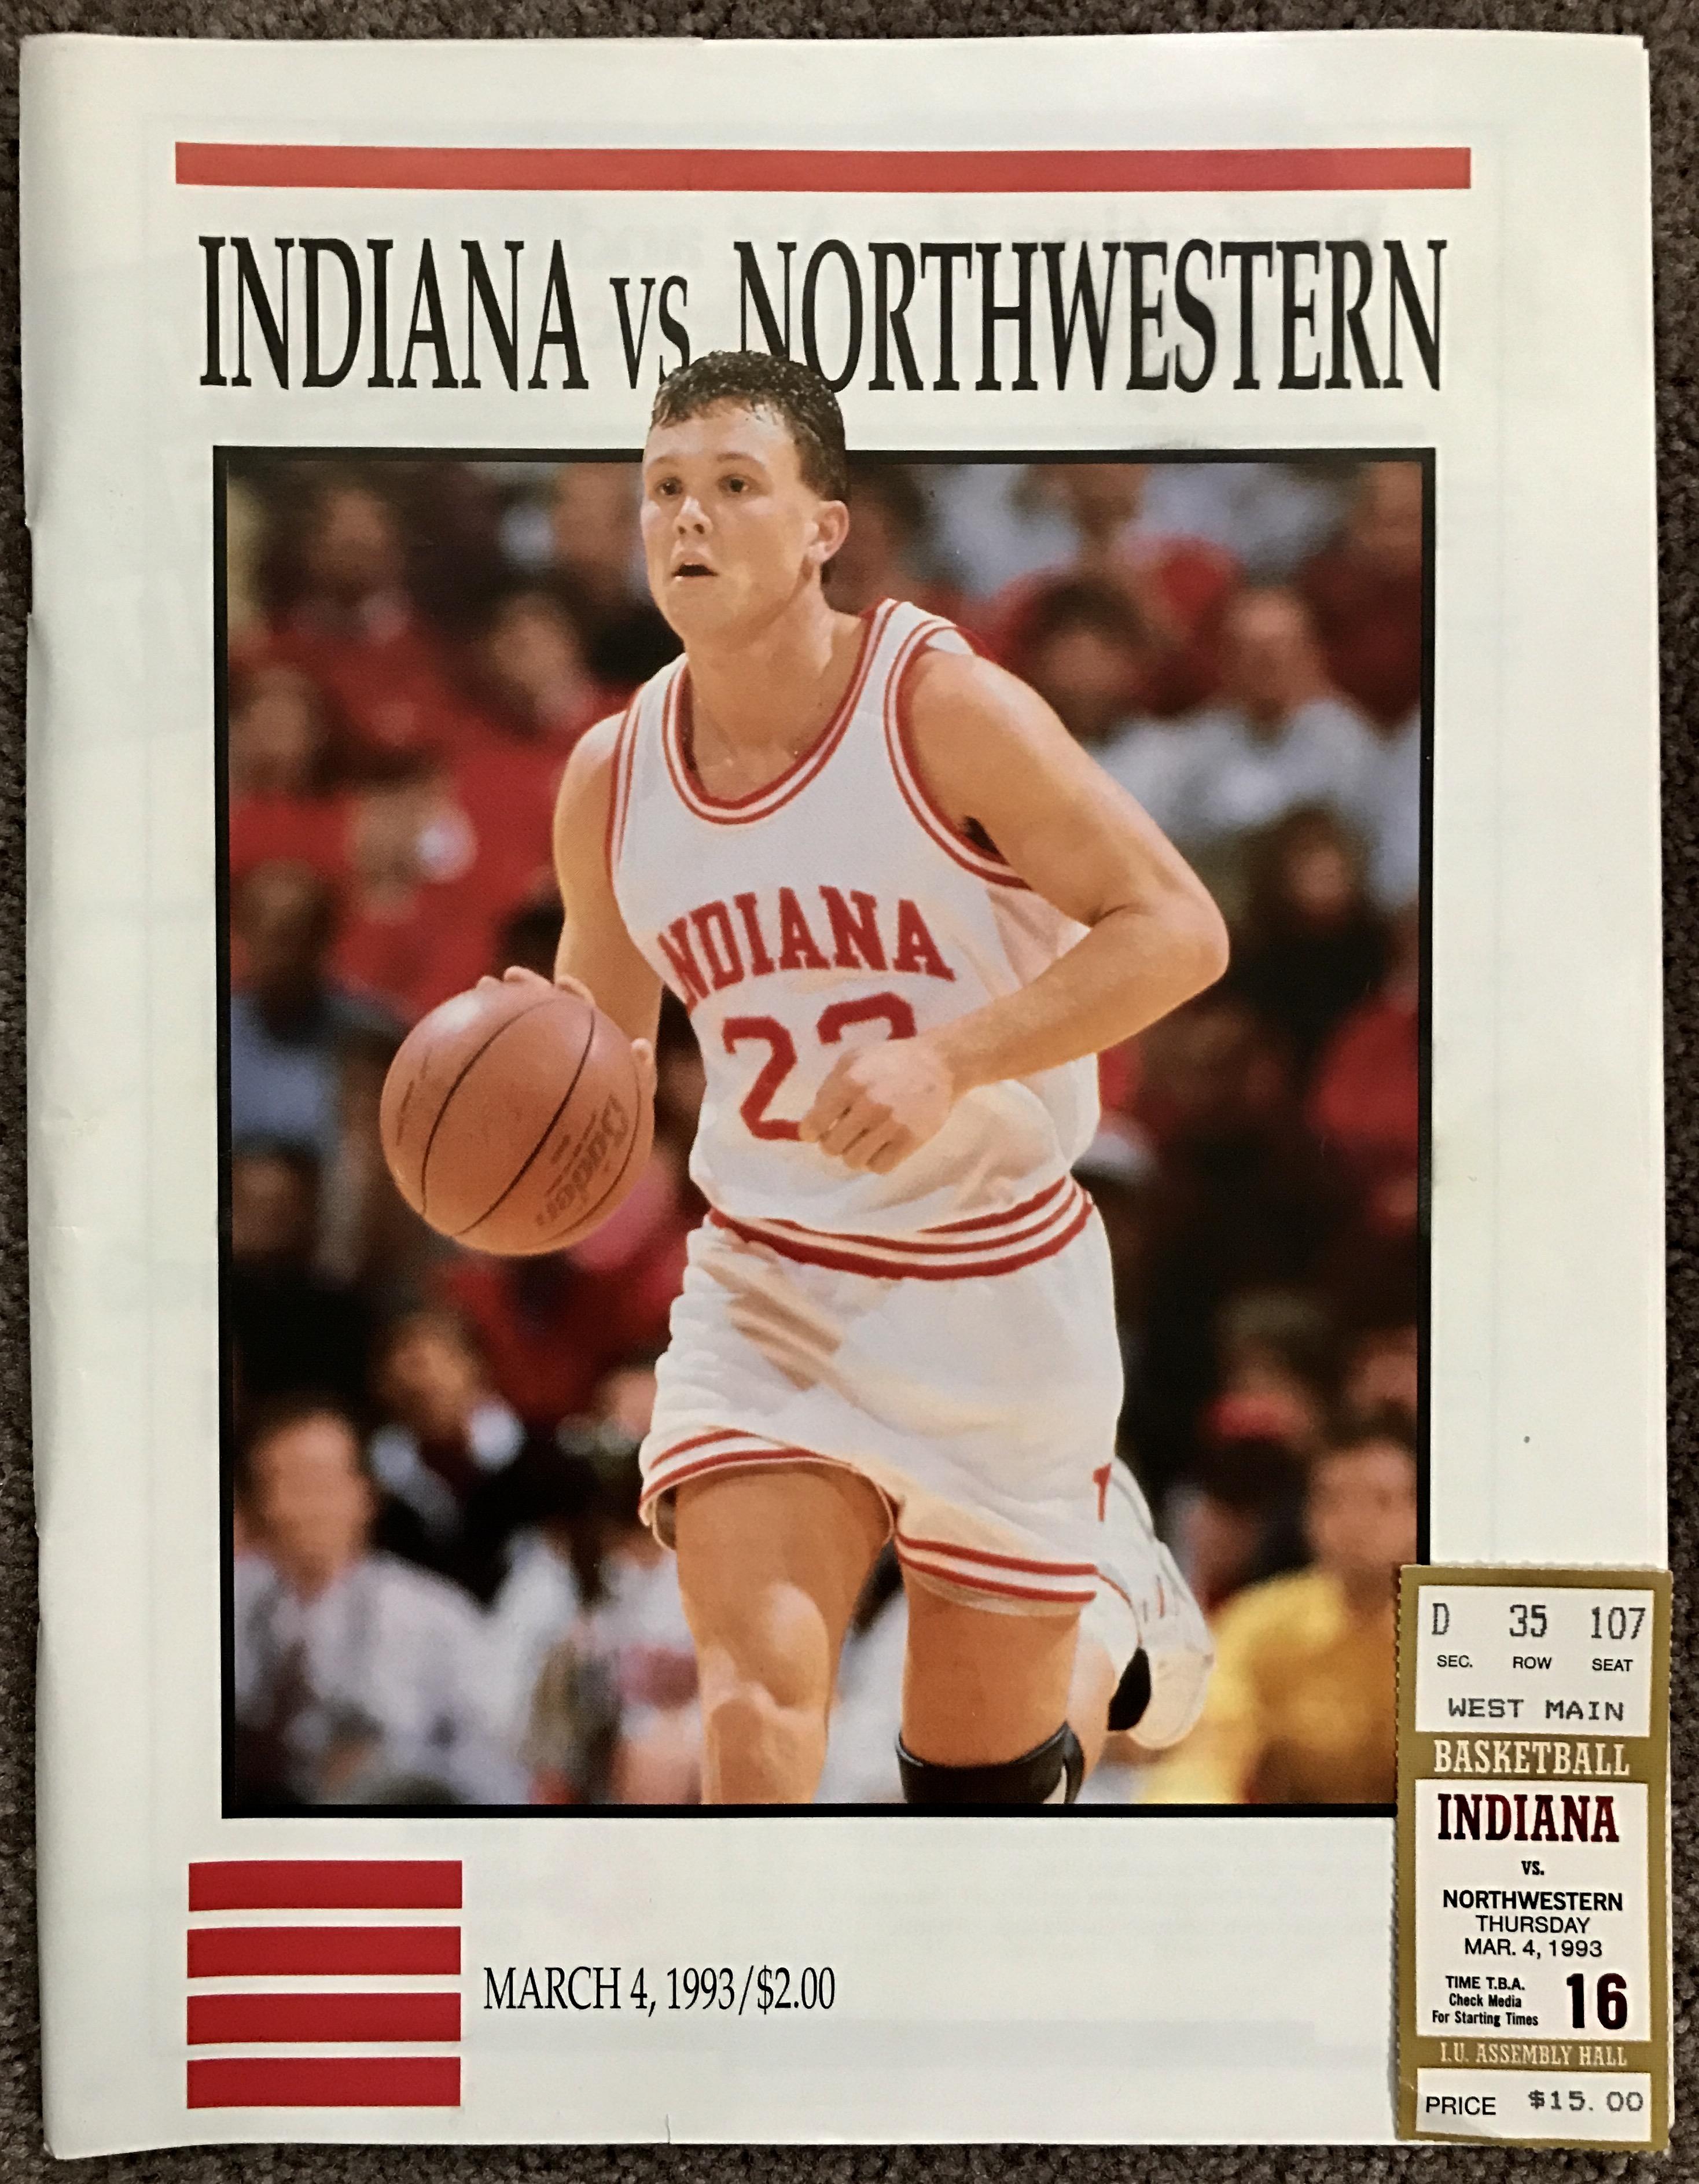 1993 Indiana versus Northwestern Program and Ticket